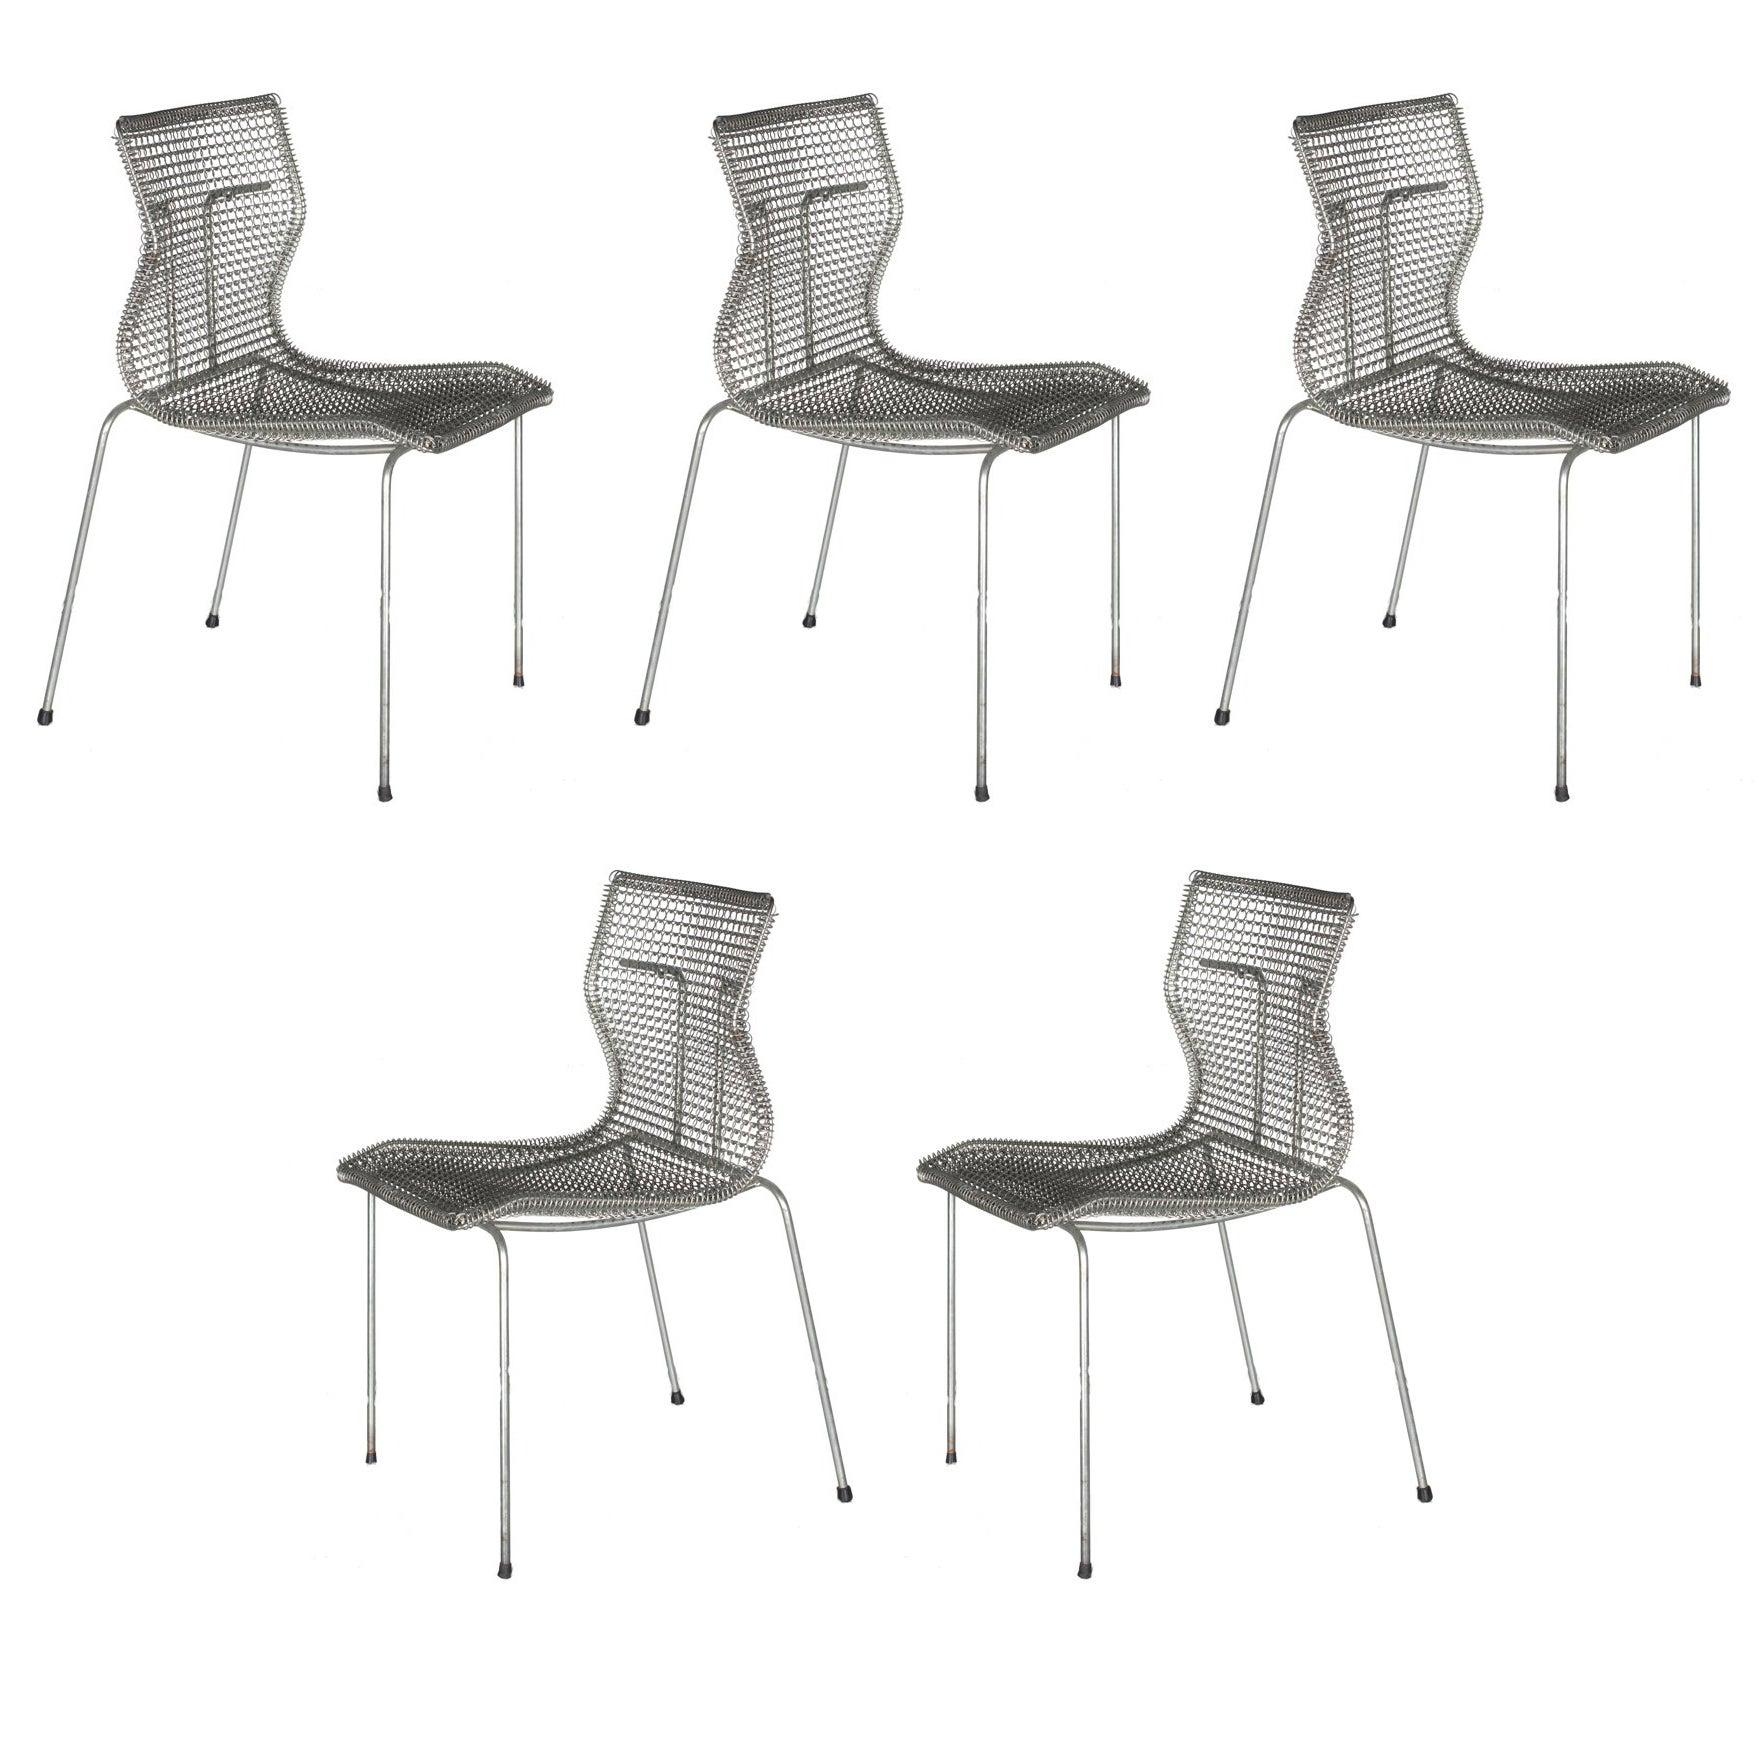 Niall O'Flynn 't Spectrum Five Rascal Chairs 1997 Galvanized Metal